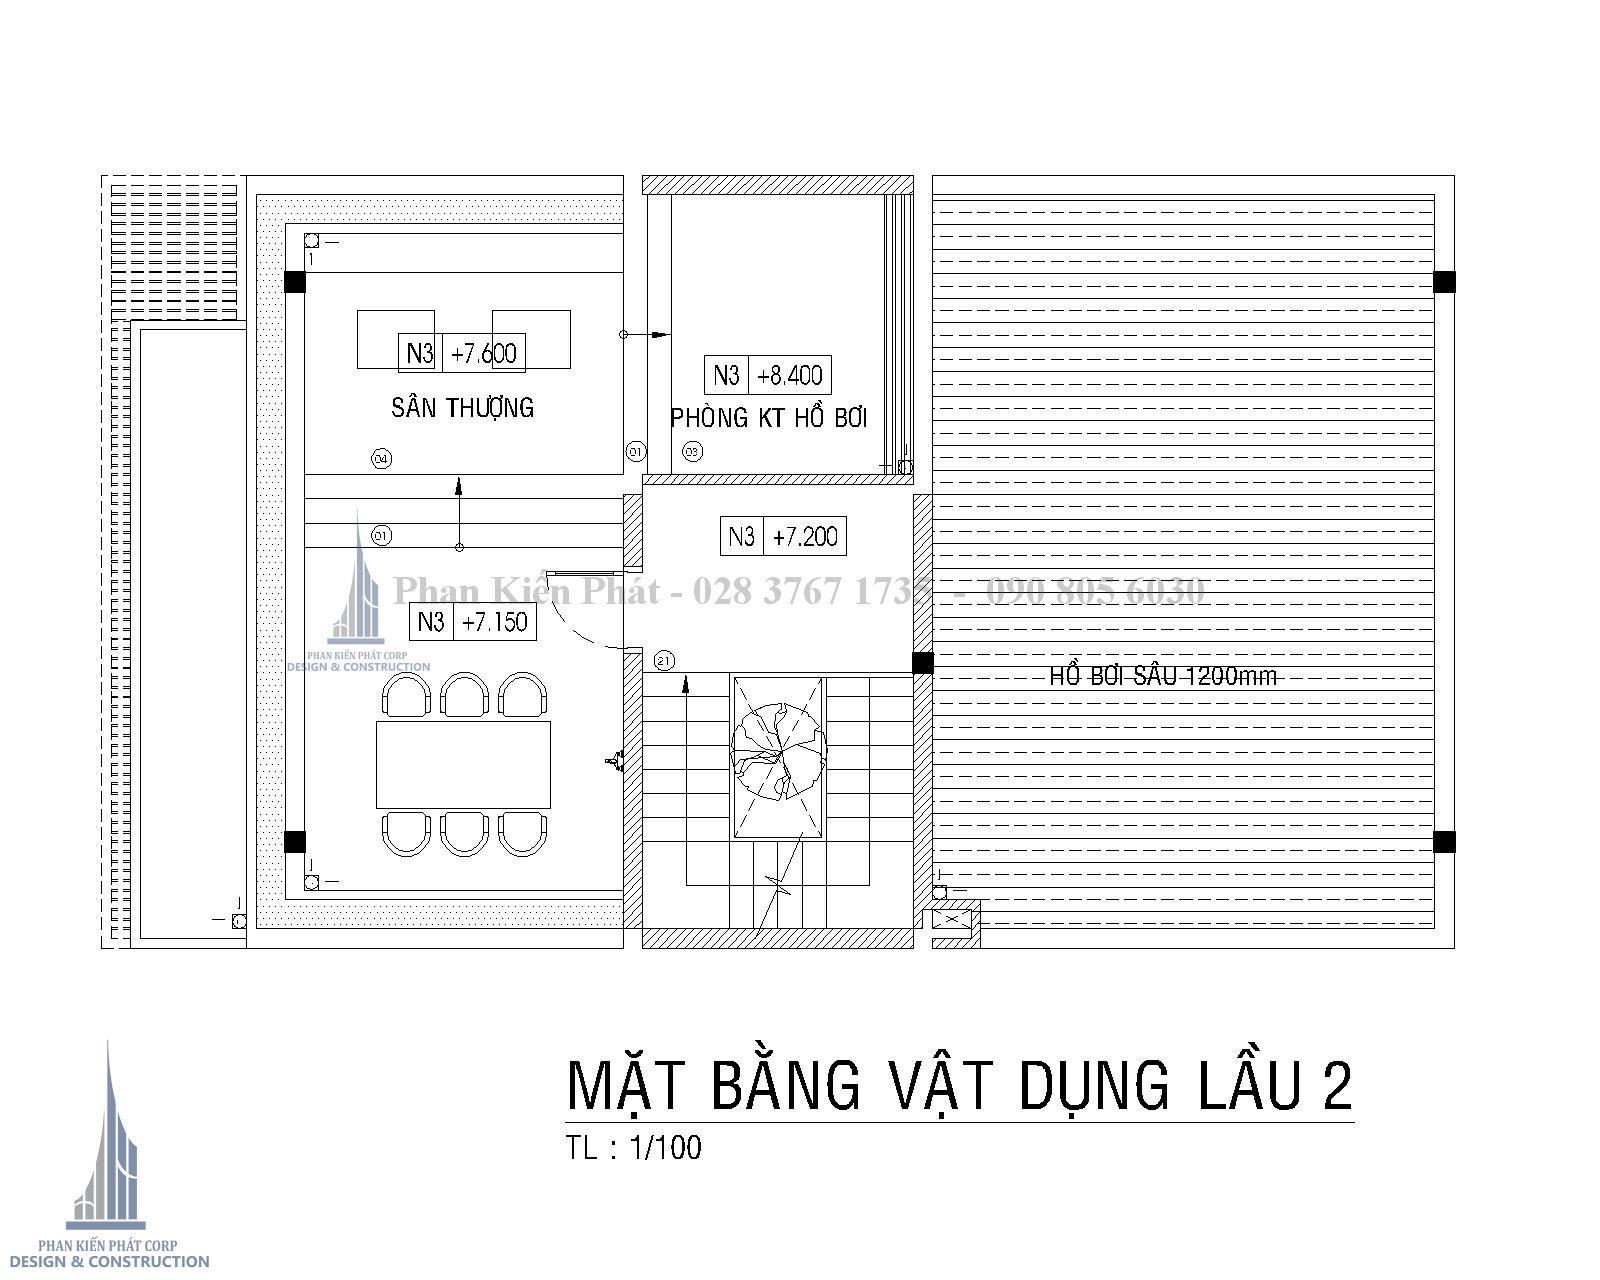 Mat Bang Lau 2 Biet Thu Pho Hien Dai Binh Phuoc